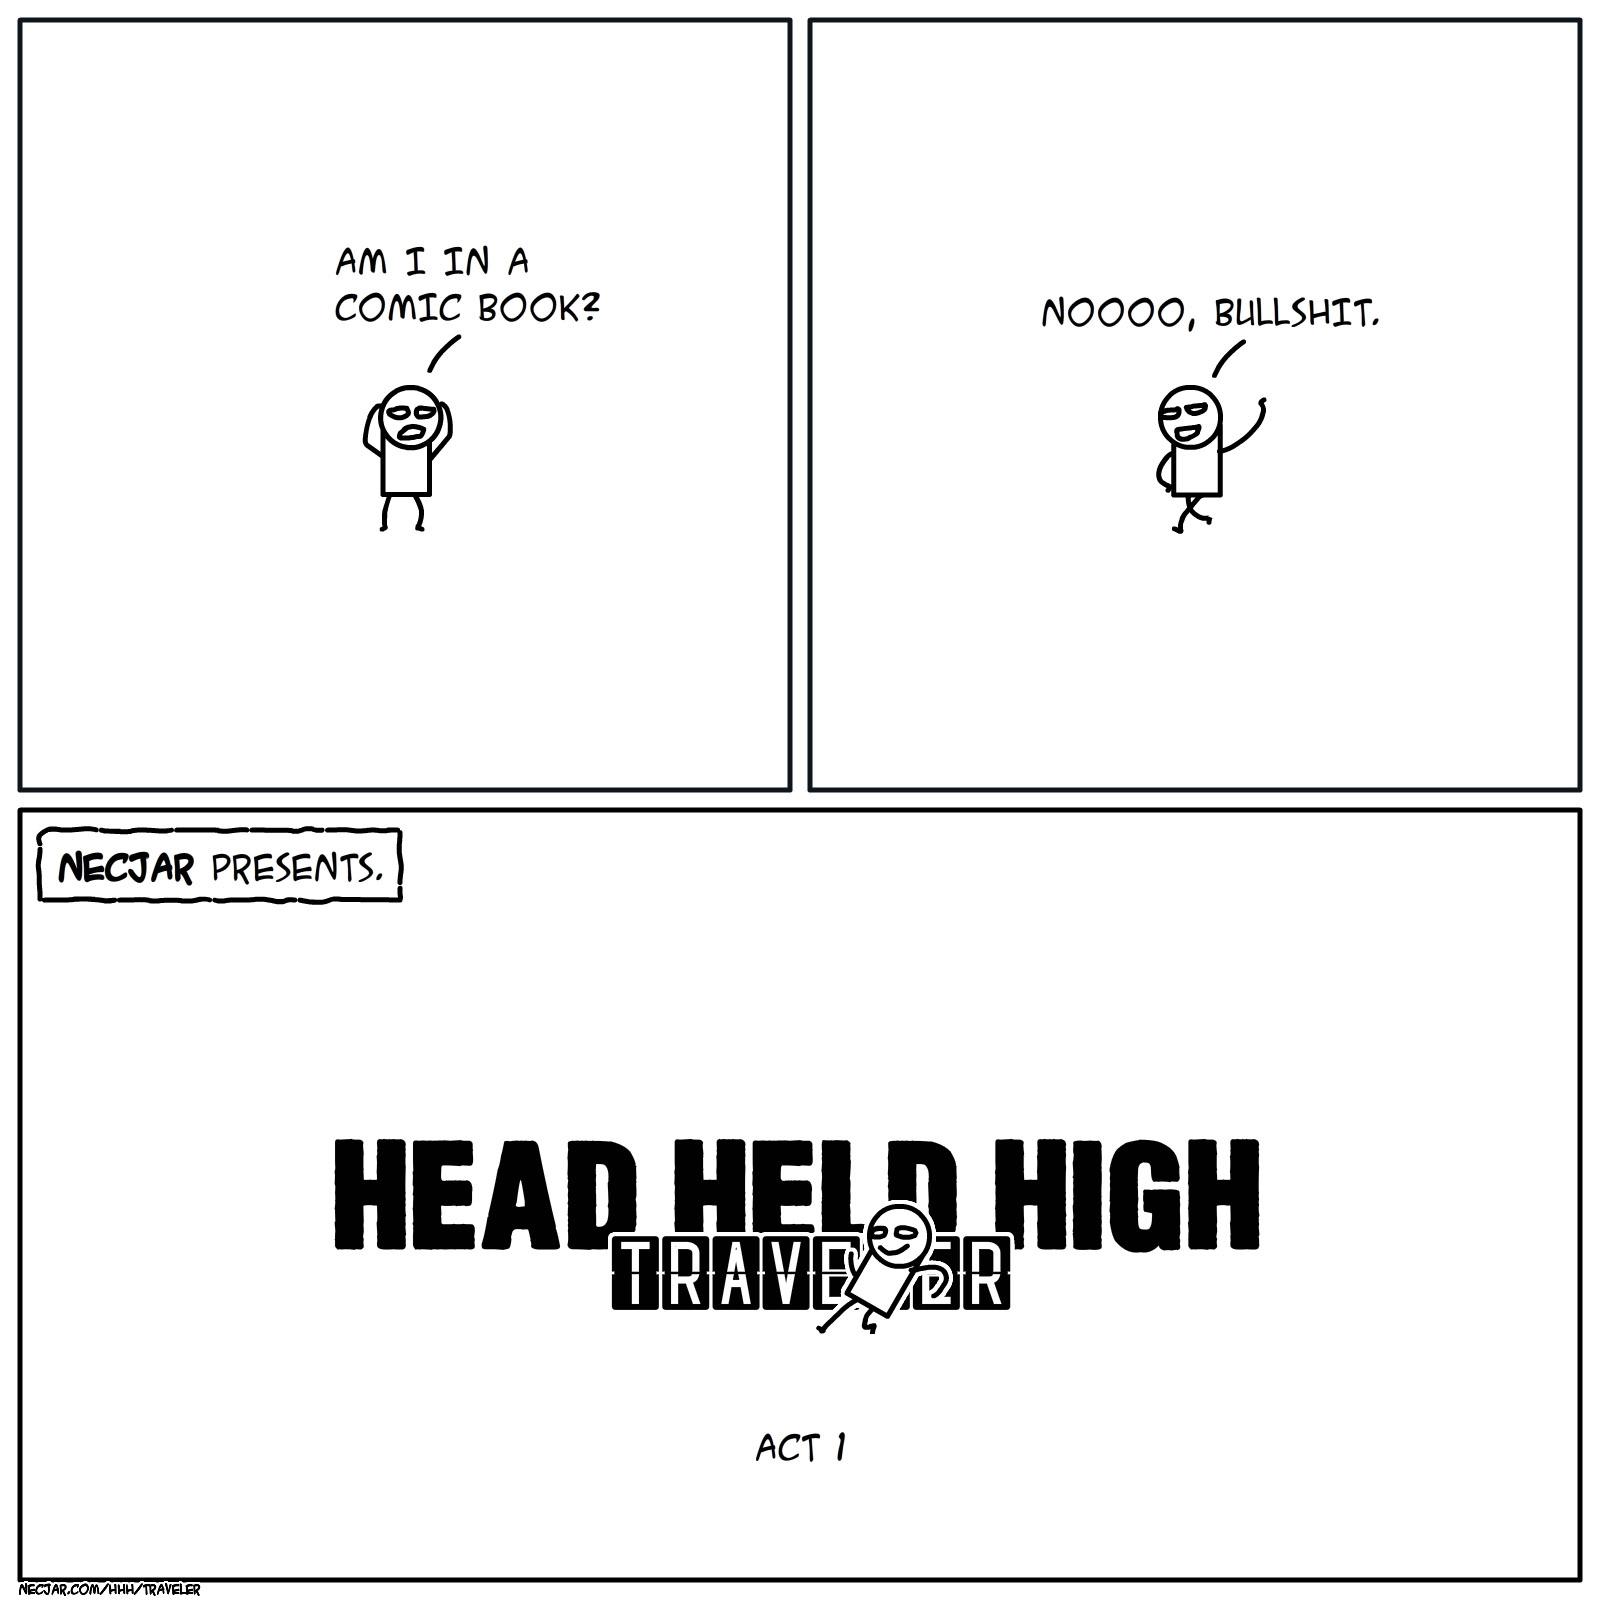 NECjAR presents, Travis, Traveler, comics, HHH, Head Held High, Head Held High: Traveler, Высоко Поднятой Головой